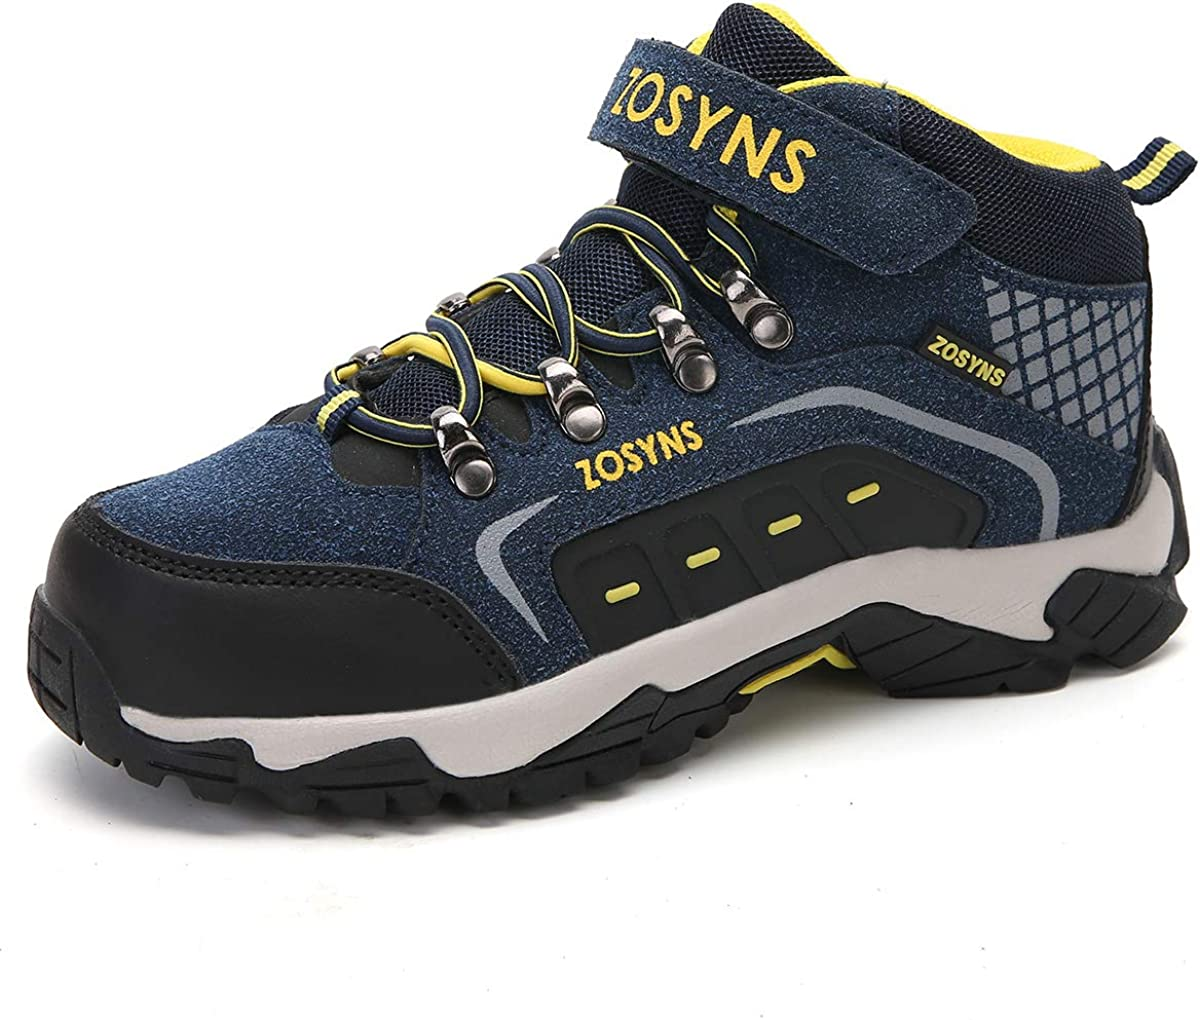 Zapatillas de Senderismo Montaña Trekking Unisex Niños Calzados de ...